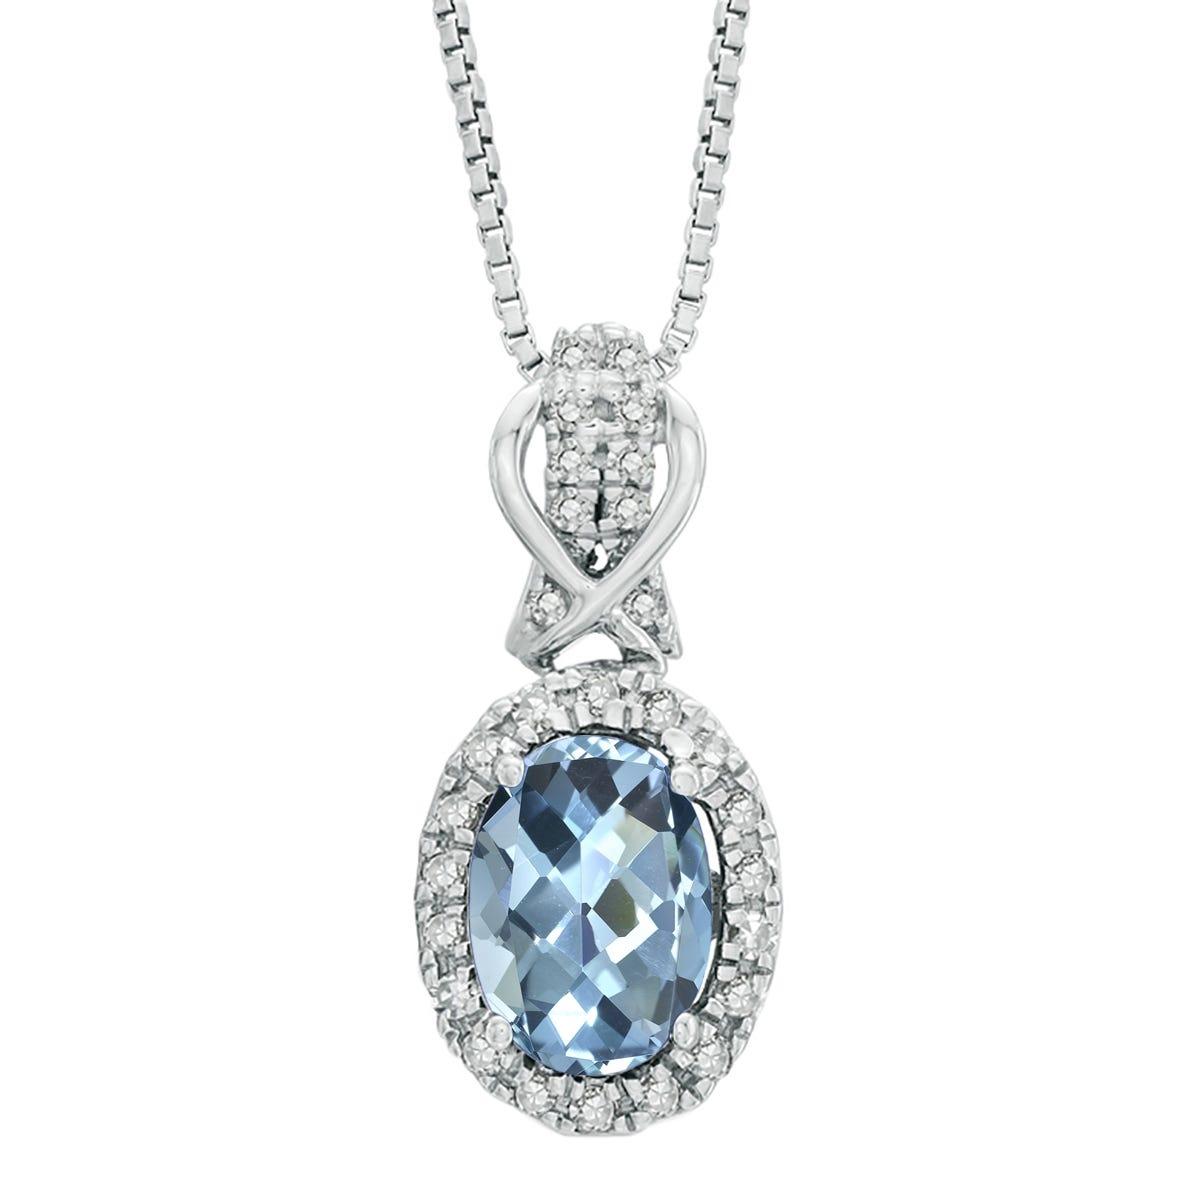 Oval Aquamarine Gemstone & Diamond Pendant in 10k White Gold